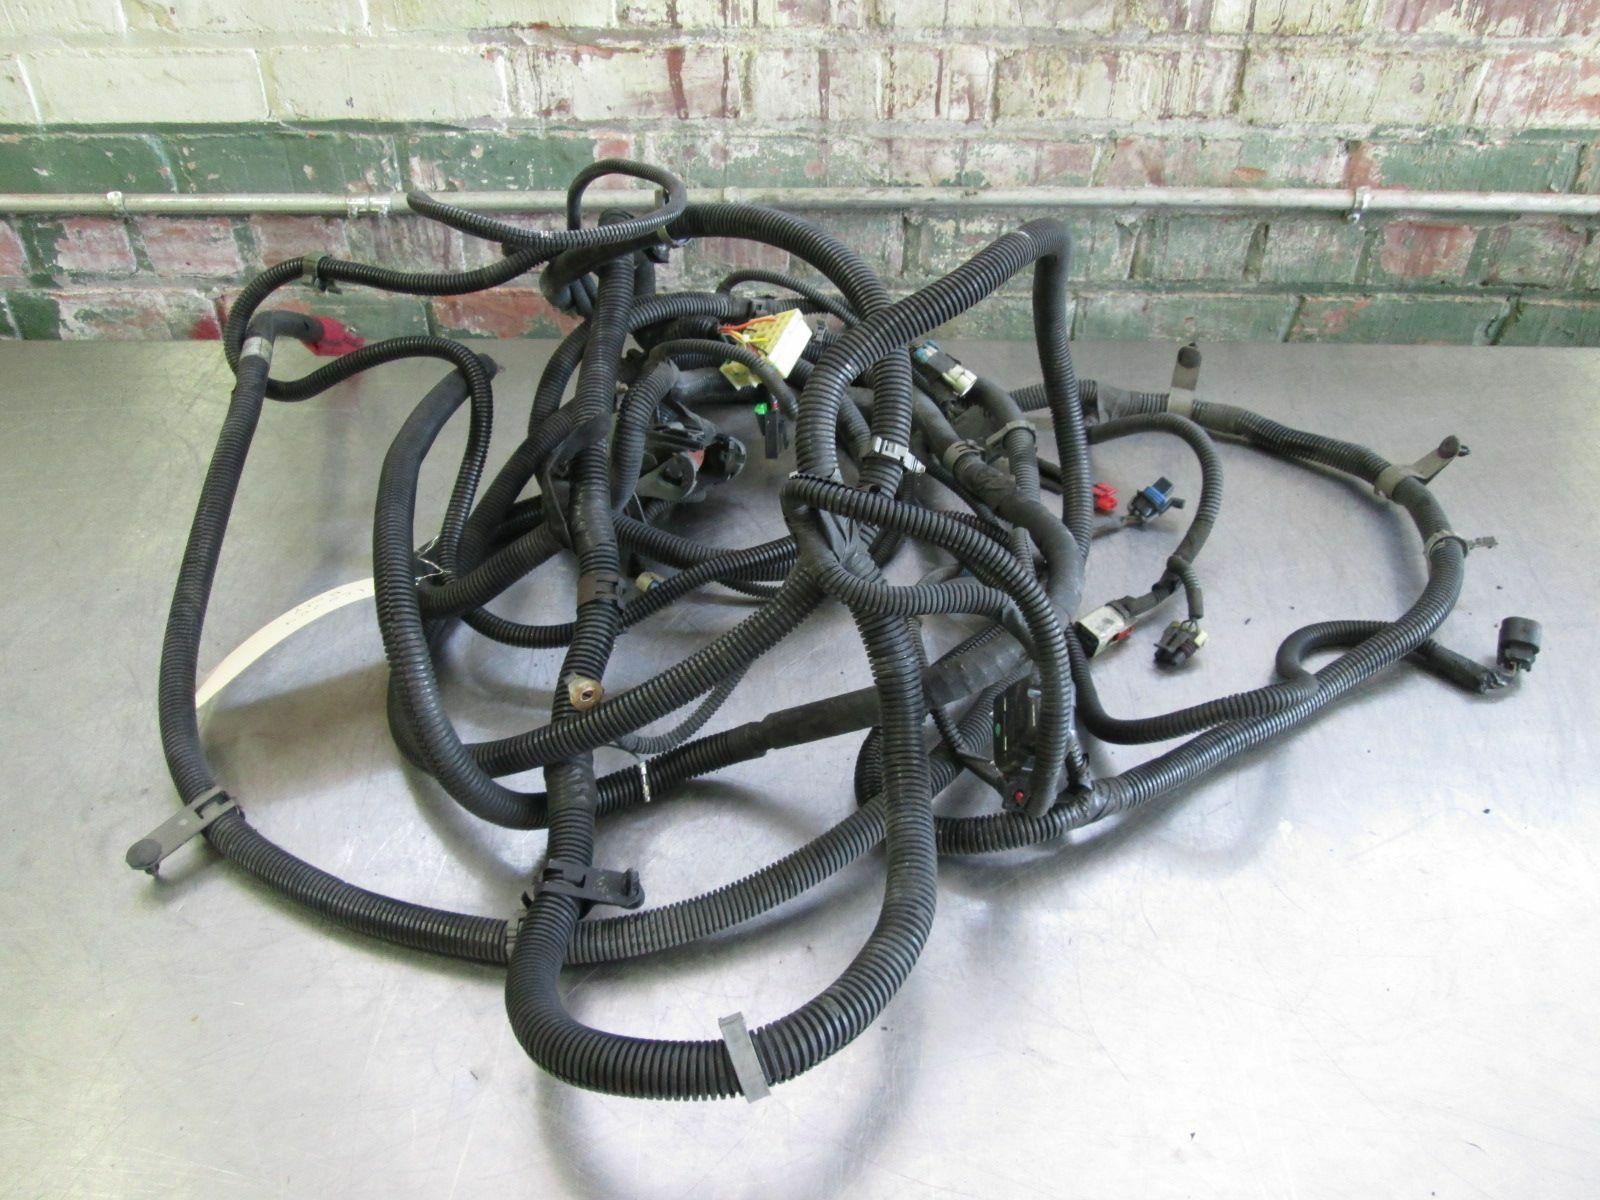 2003 Ssr Wiring Harness Schematics Diagrams 50cc Dirt Bike Diagram Body Chassis Wire 6 0l V8 Ls2 4at 4l65e M32 Chevrolet Rh Pacificmotors Com 125 Pit Mypin Pid Controller